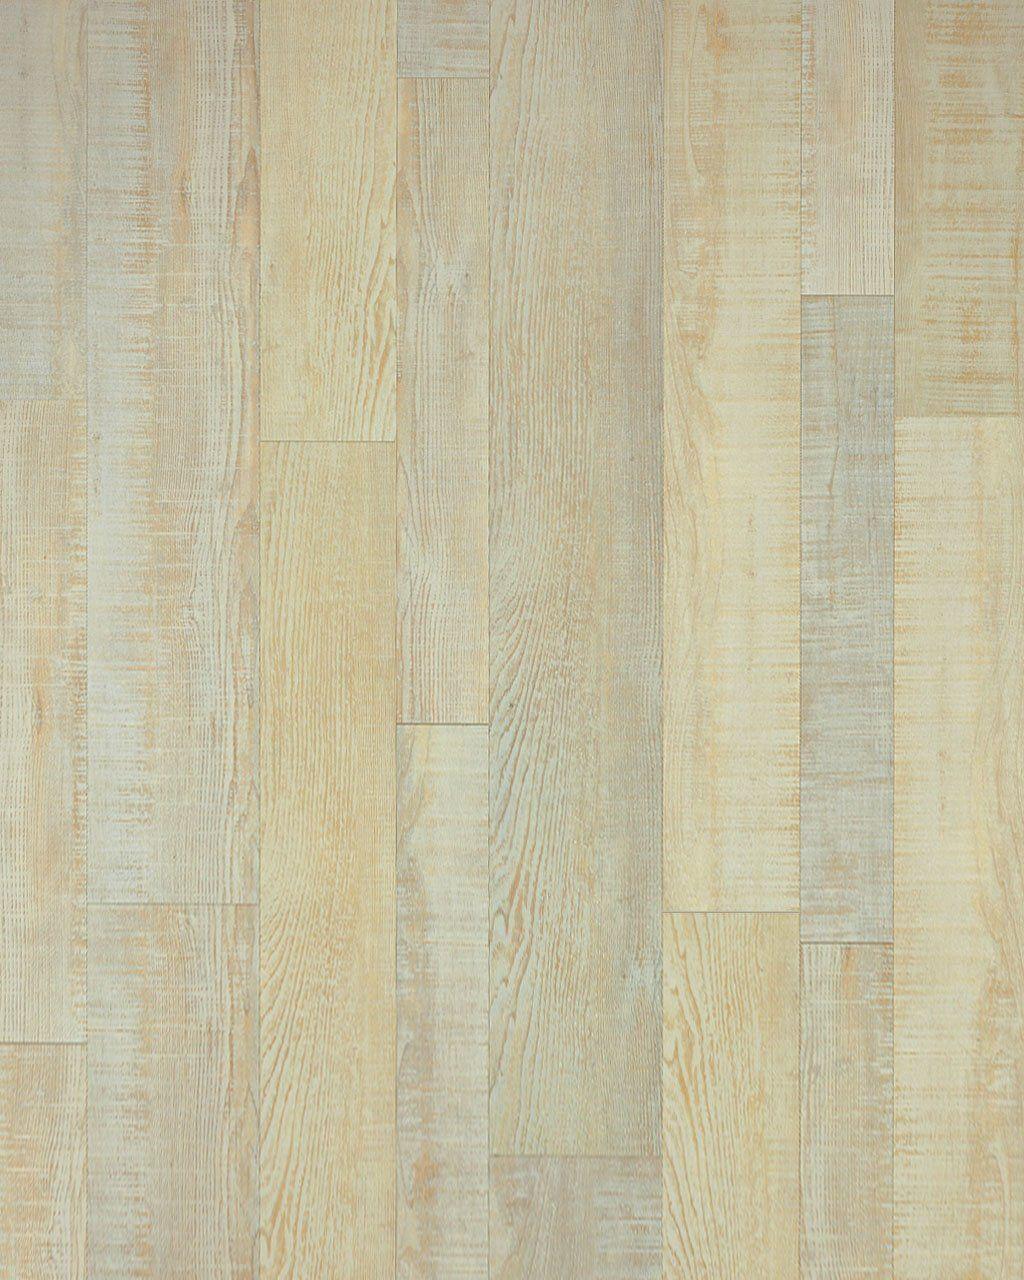 Coretec Plus Design Accolade Oak Waterproof Vinyl Floor Coretec